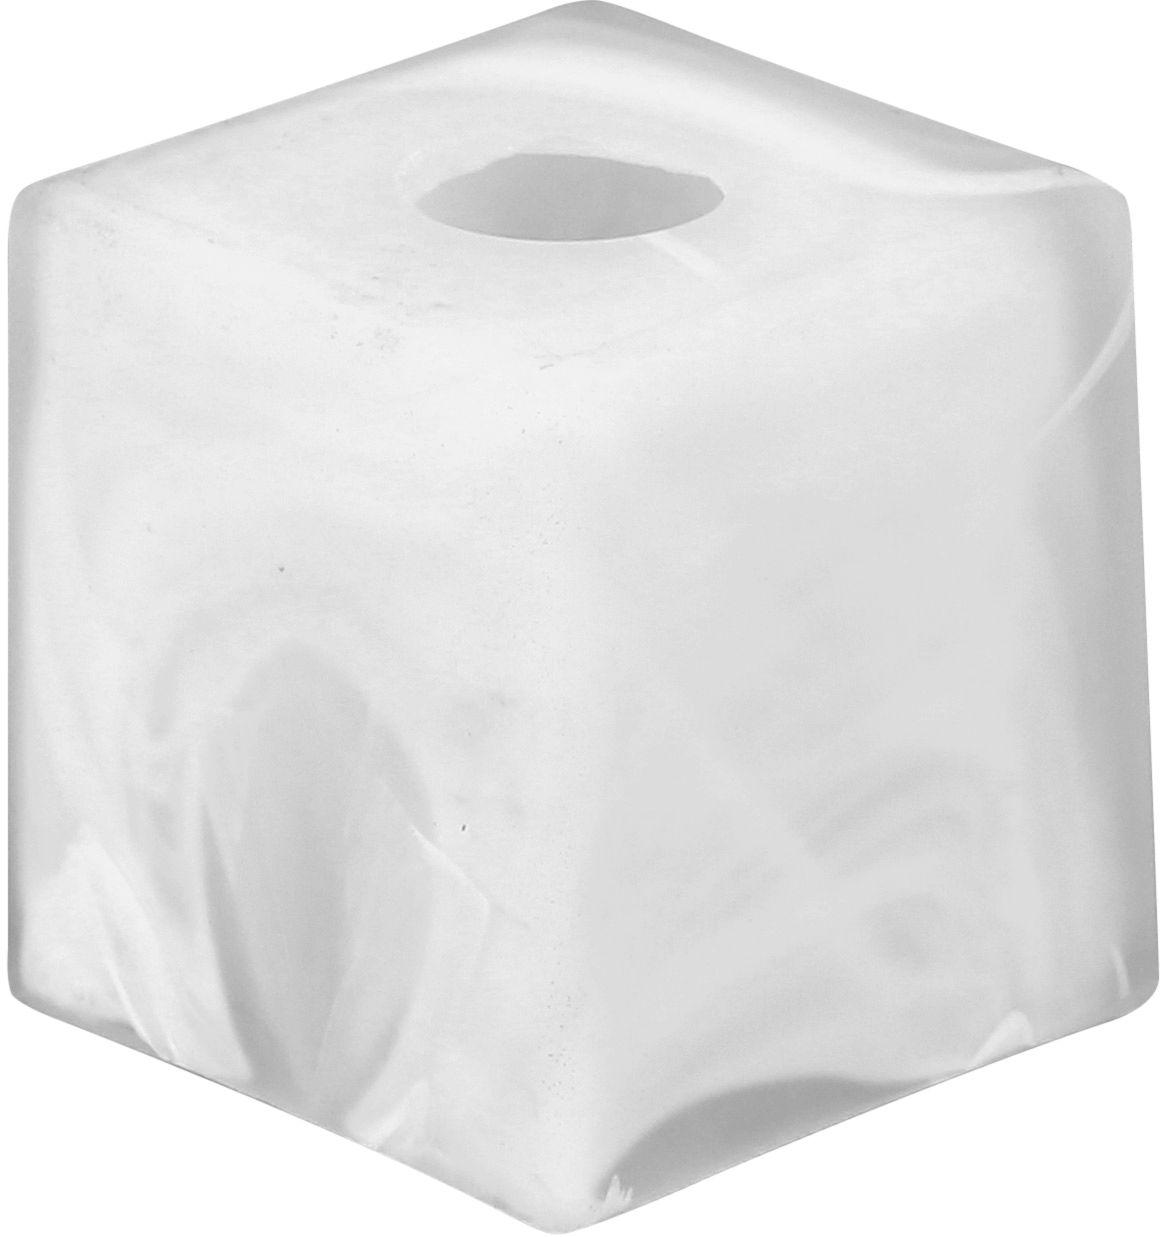 Абажур ?????????? E14 кубик 8x8cm белая ??? люстры